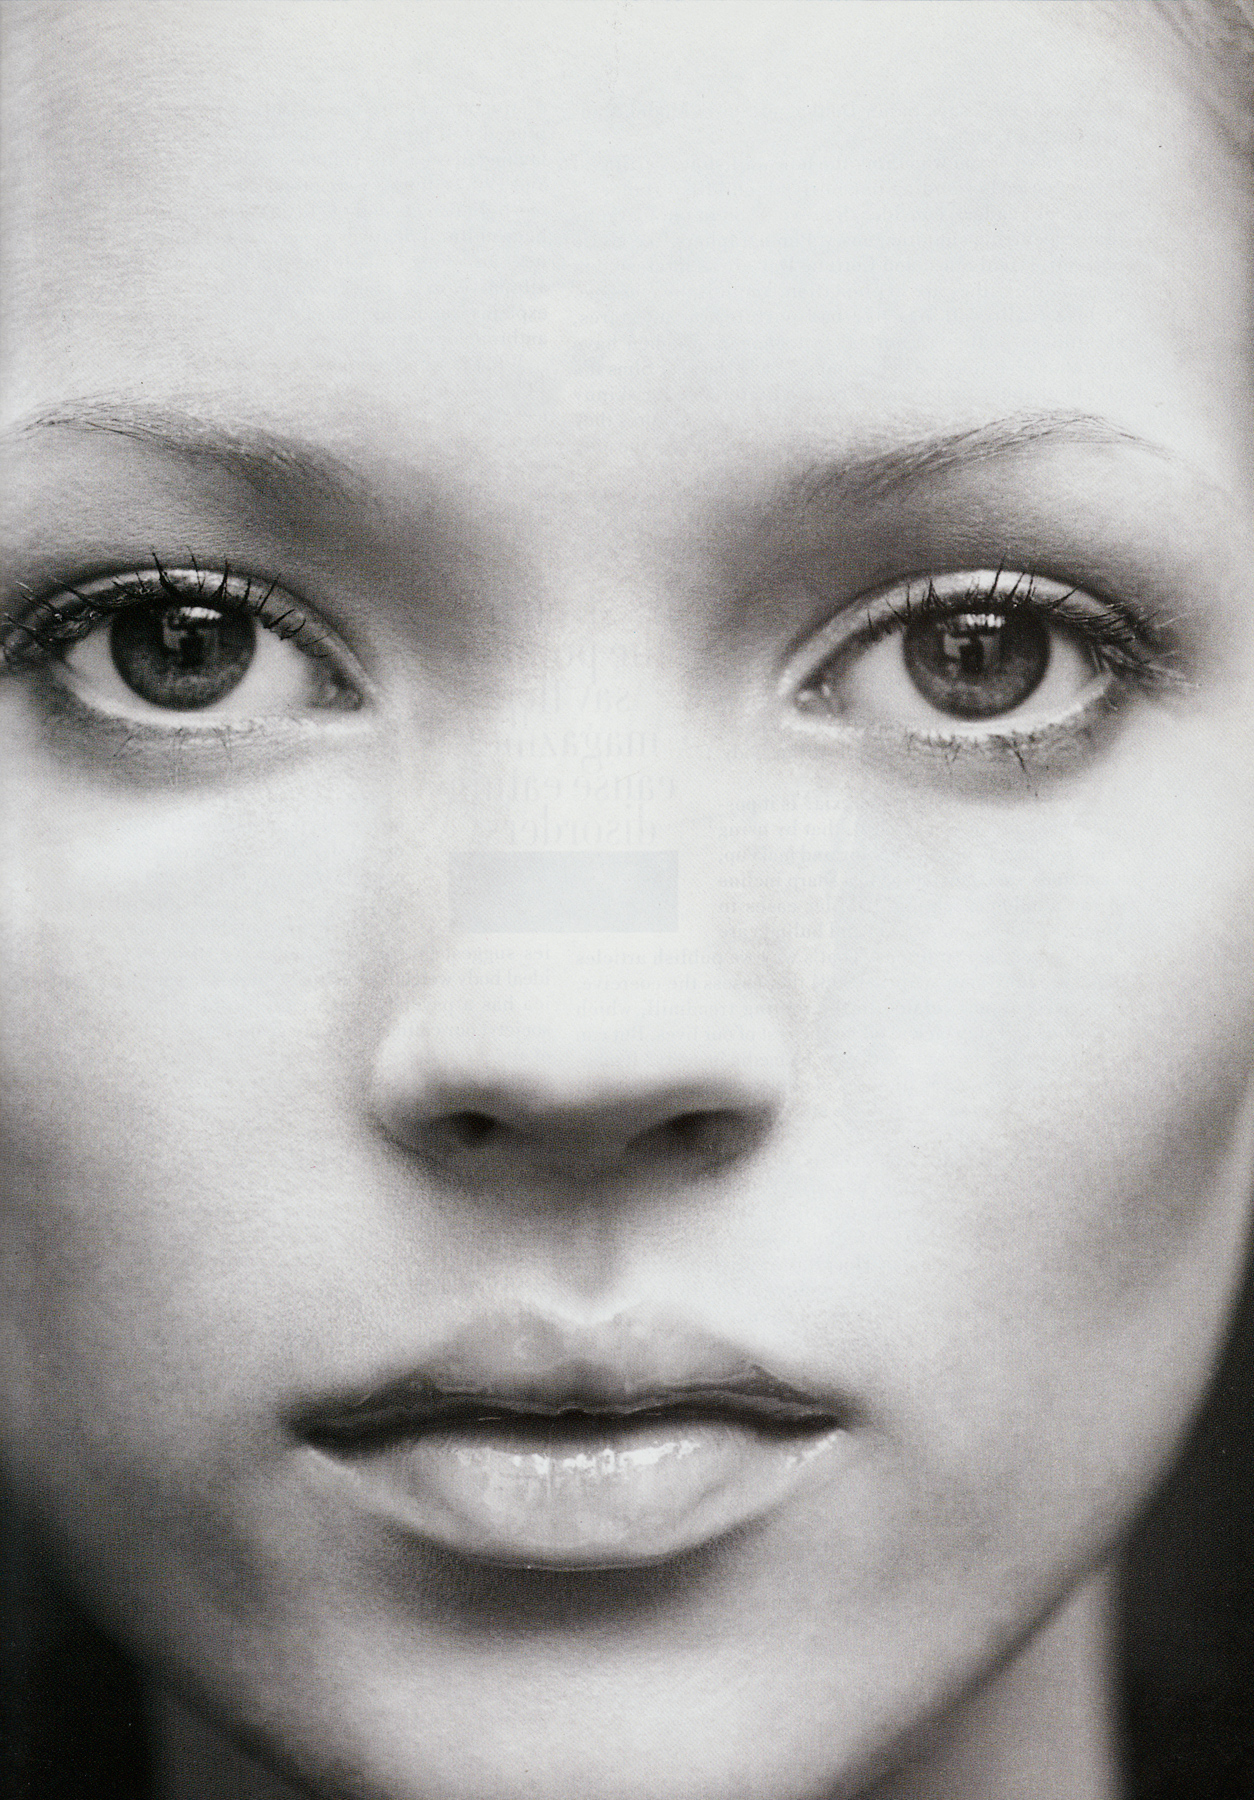 Kate Moss: Dos cosas